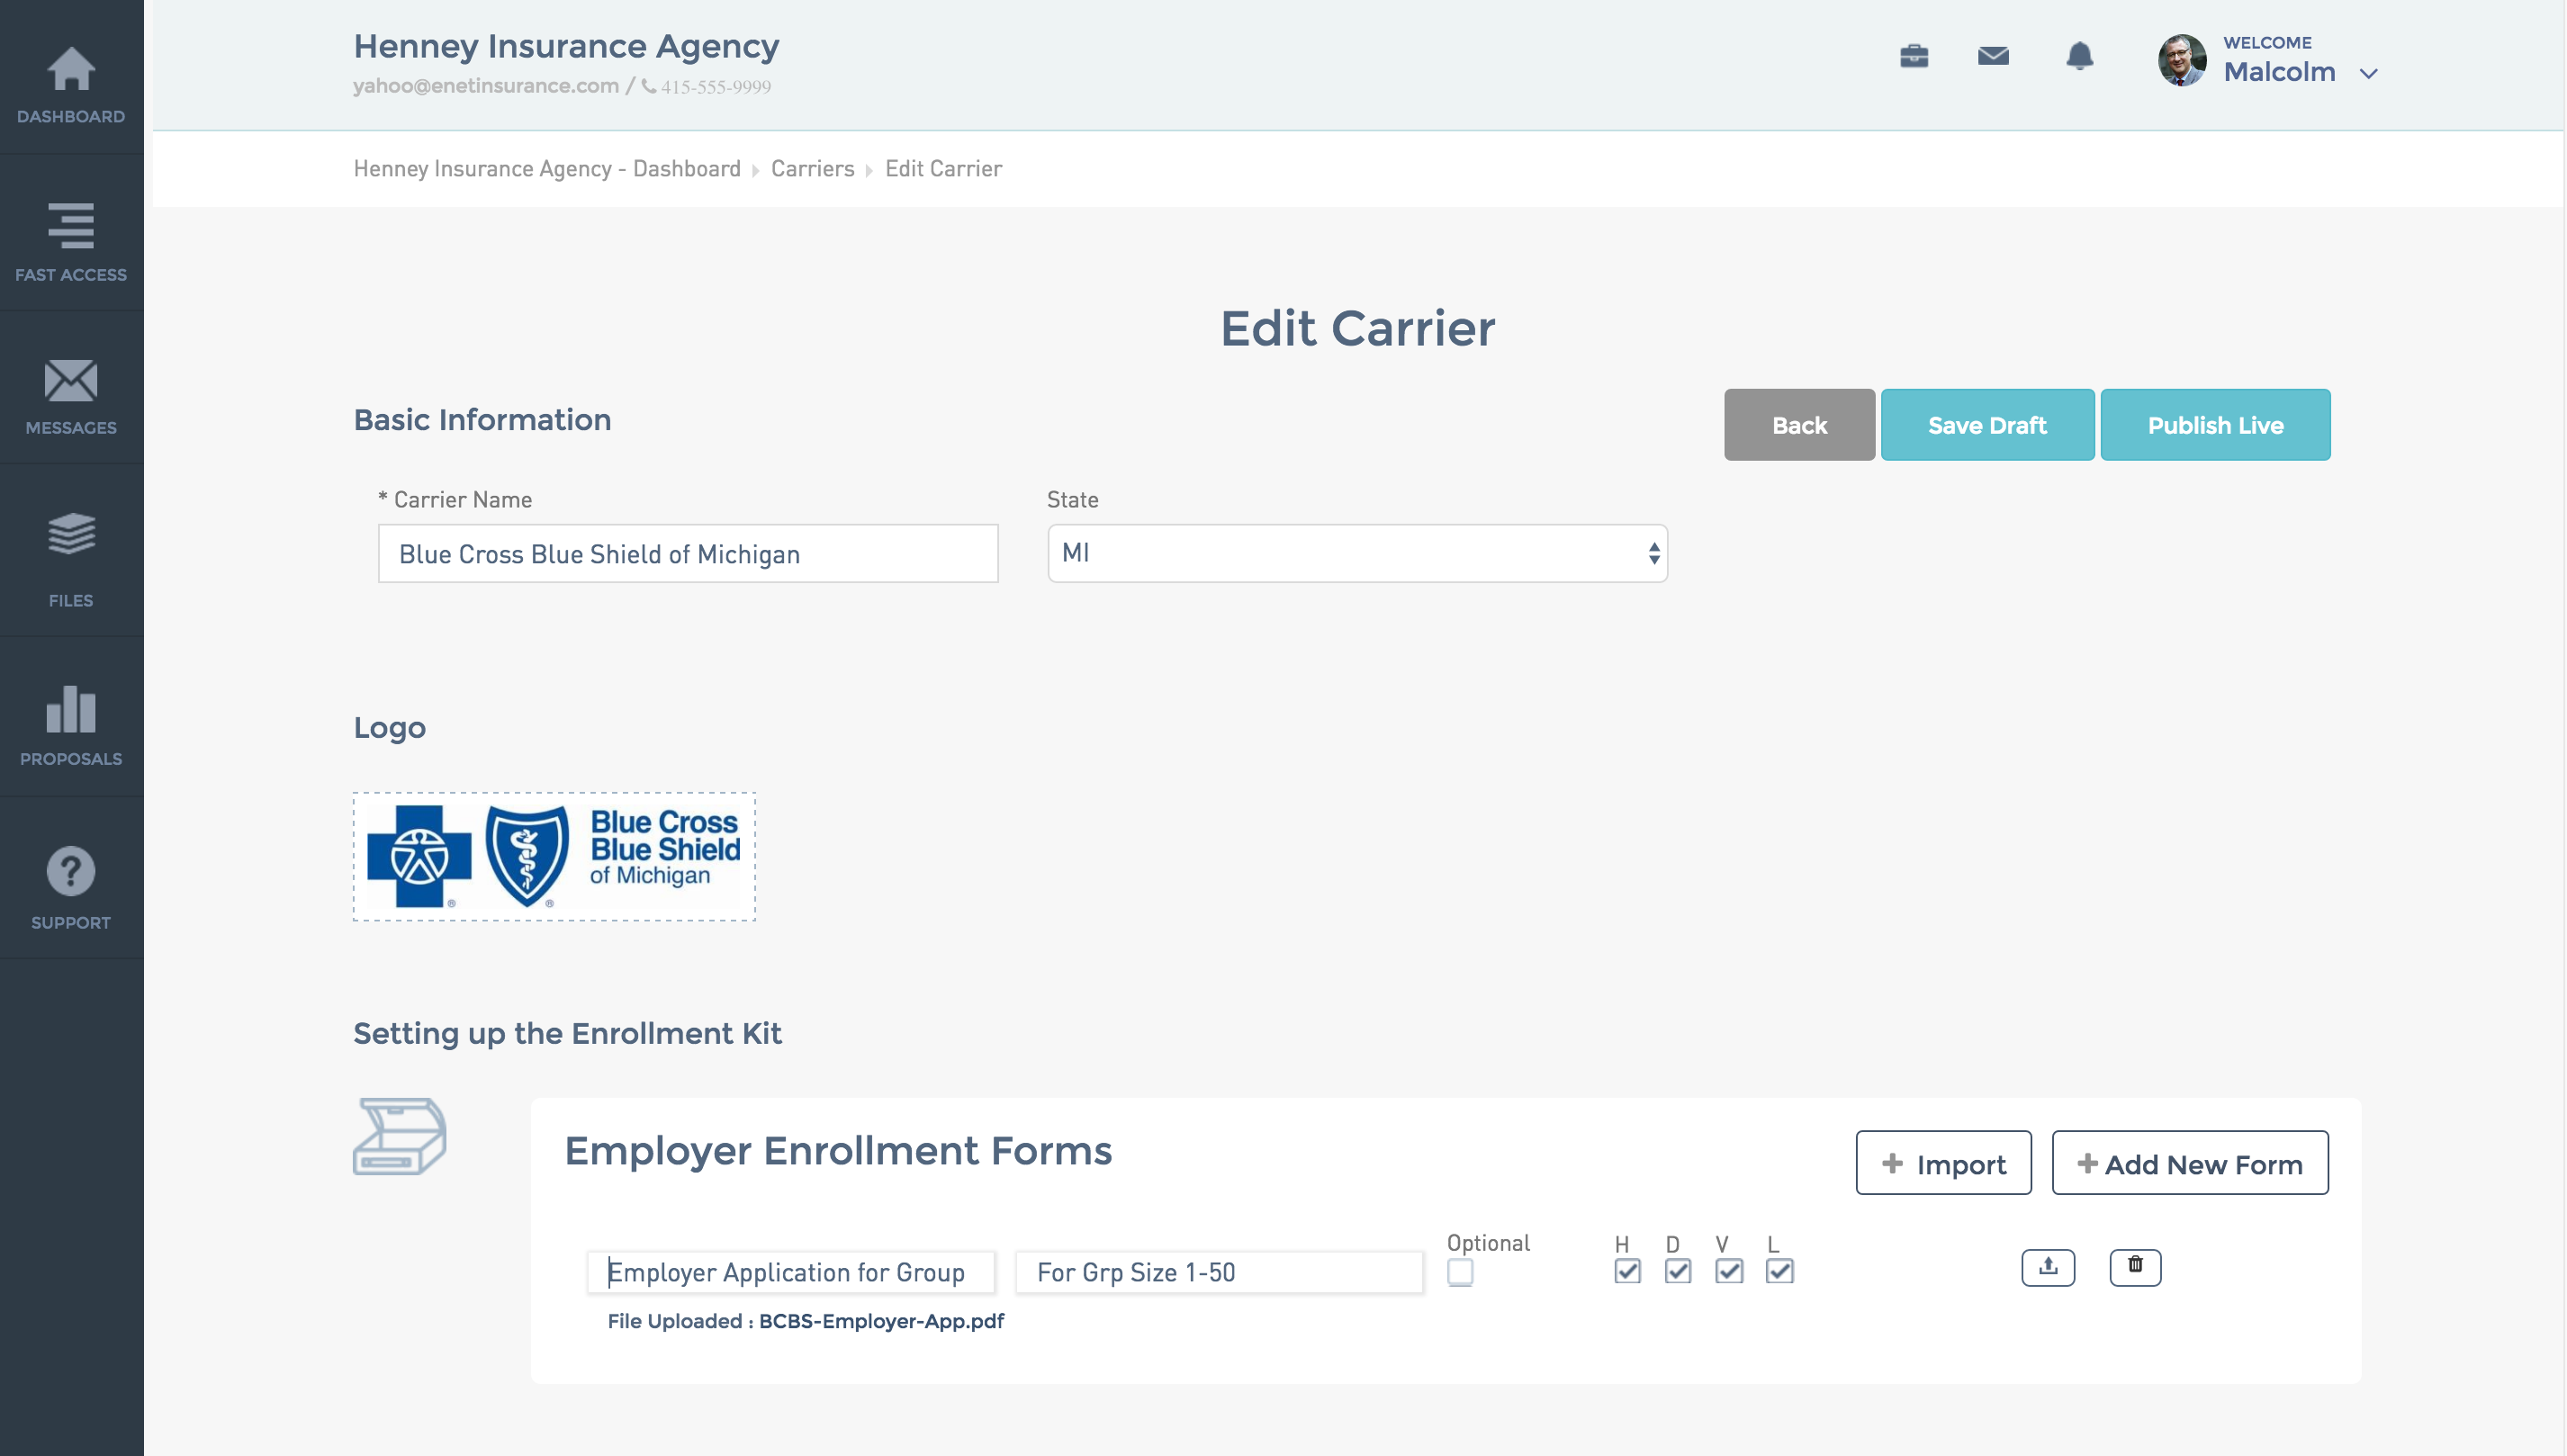 NextBroker Insurance Brokers Software Solutions & CRM